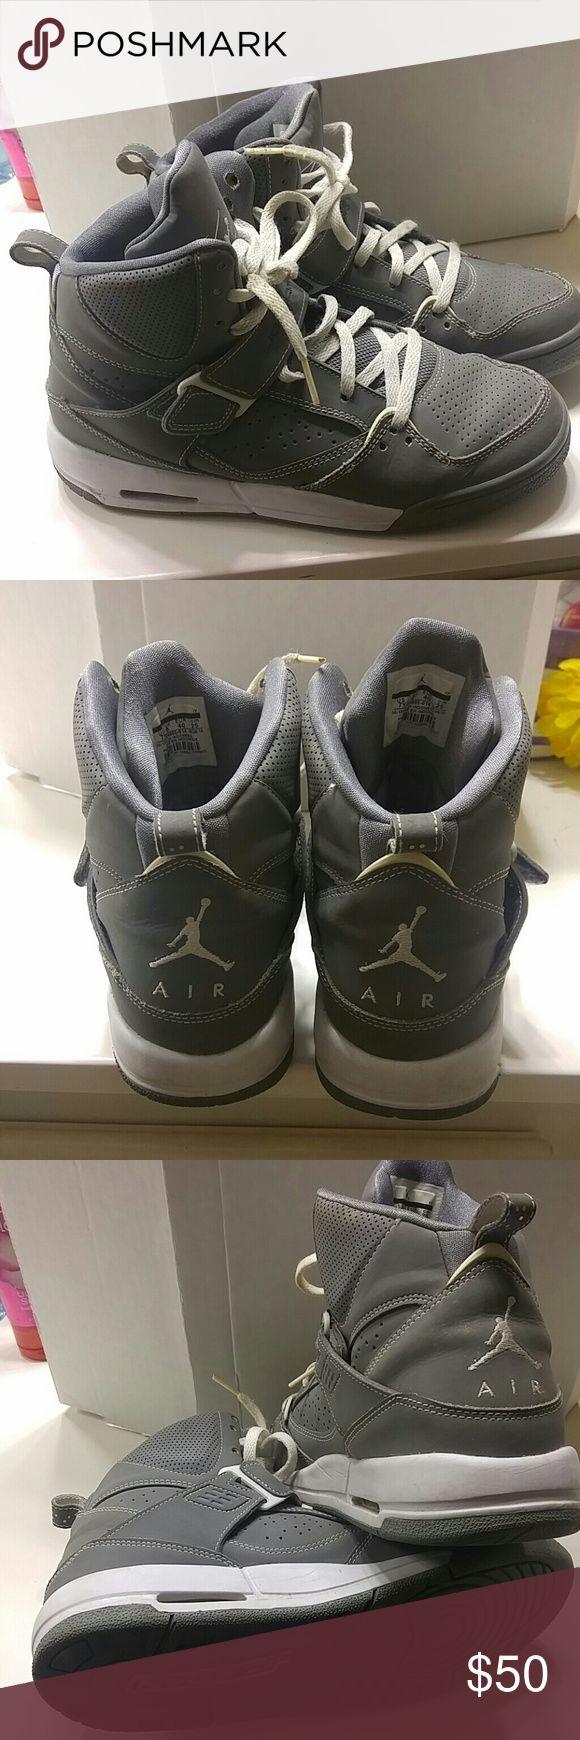 Nike High tops Jordan Flights Gray Jordan flights Nike Shoes Athletic Shoes